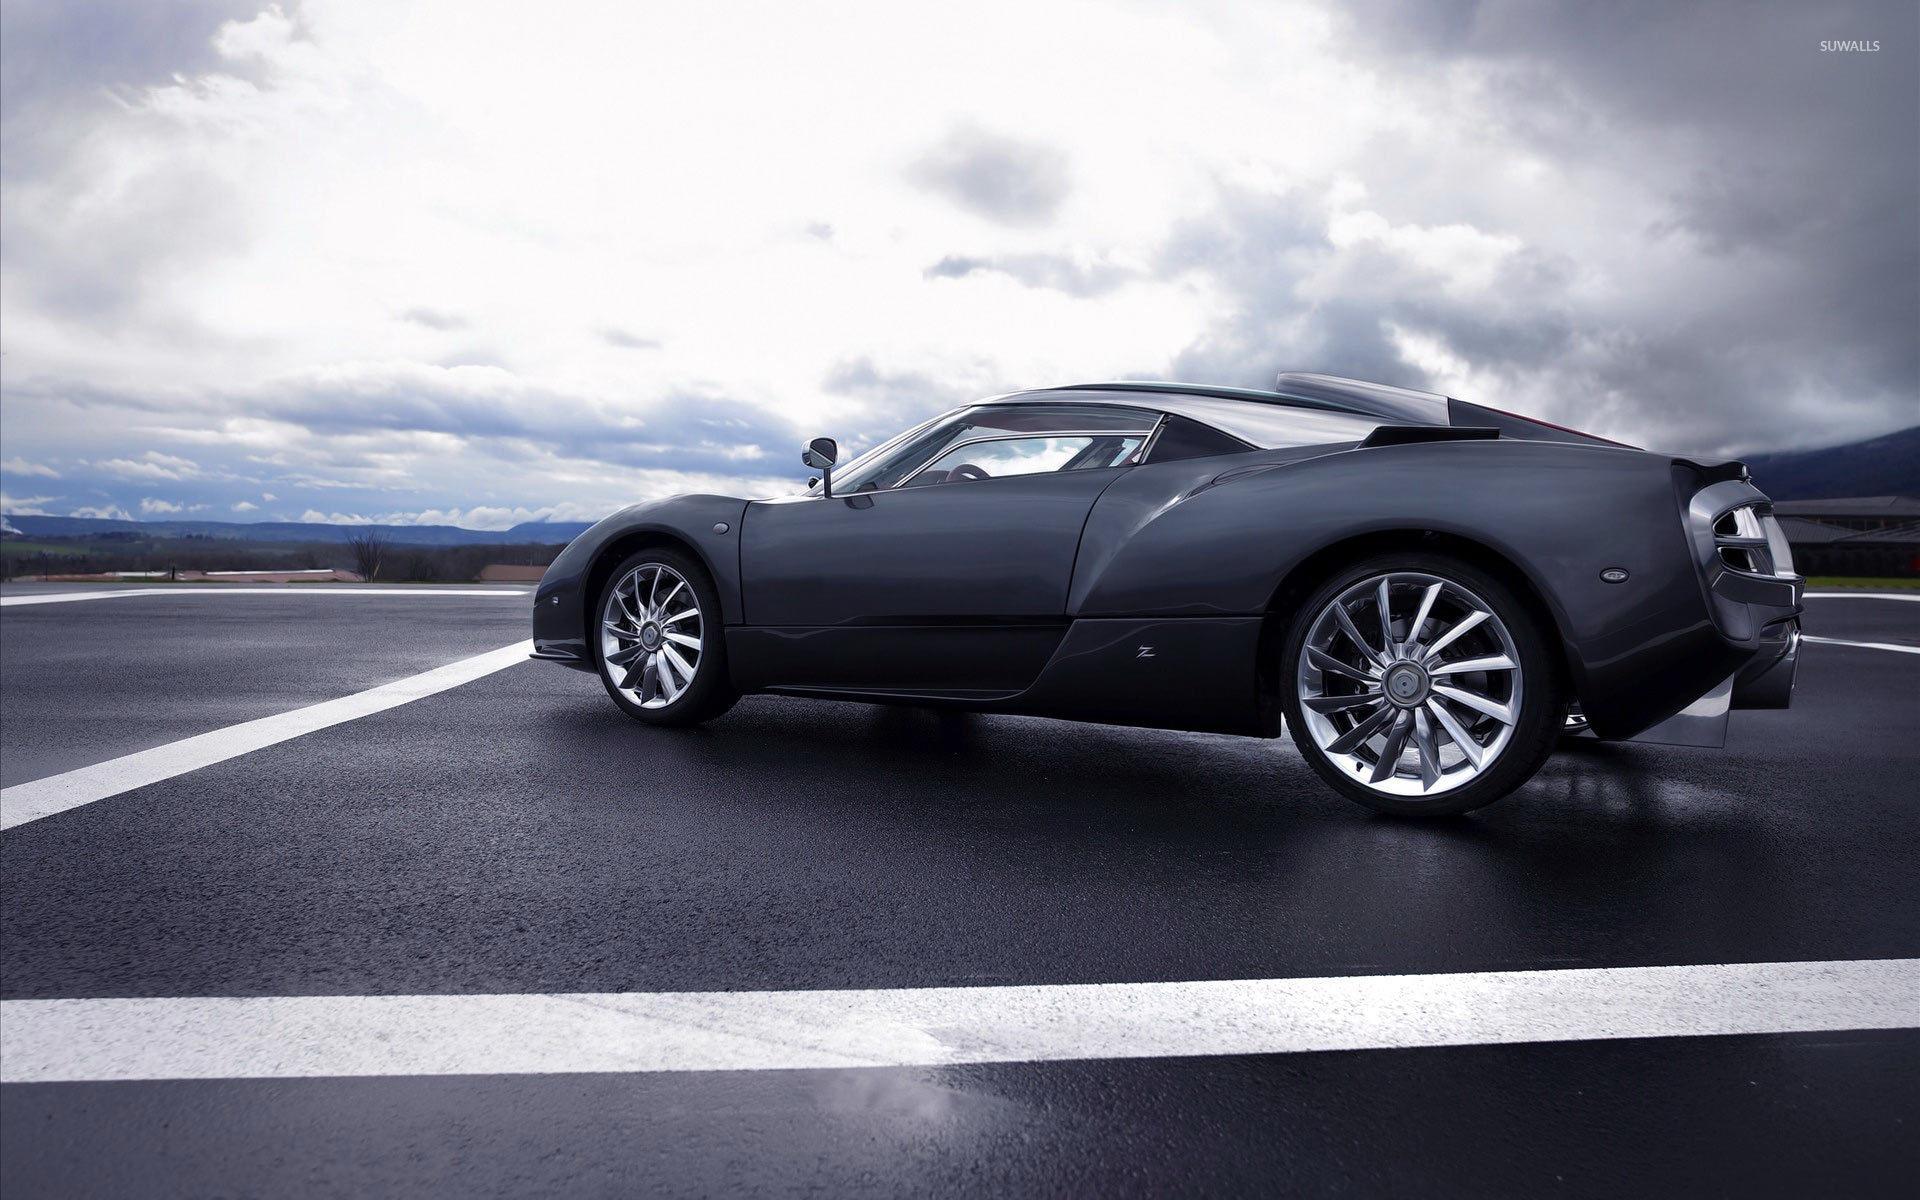 bugatti veyron grand sport vitesse legend black bess 2014 wallpapers 70 wallpapers. Black Bedroom Furniture Sets. Home Design Ideas